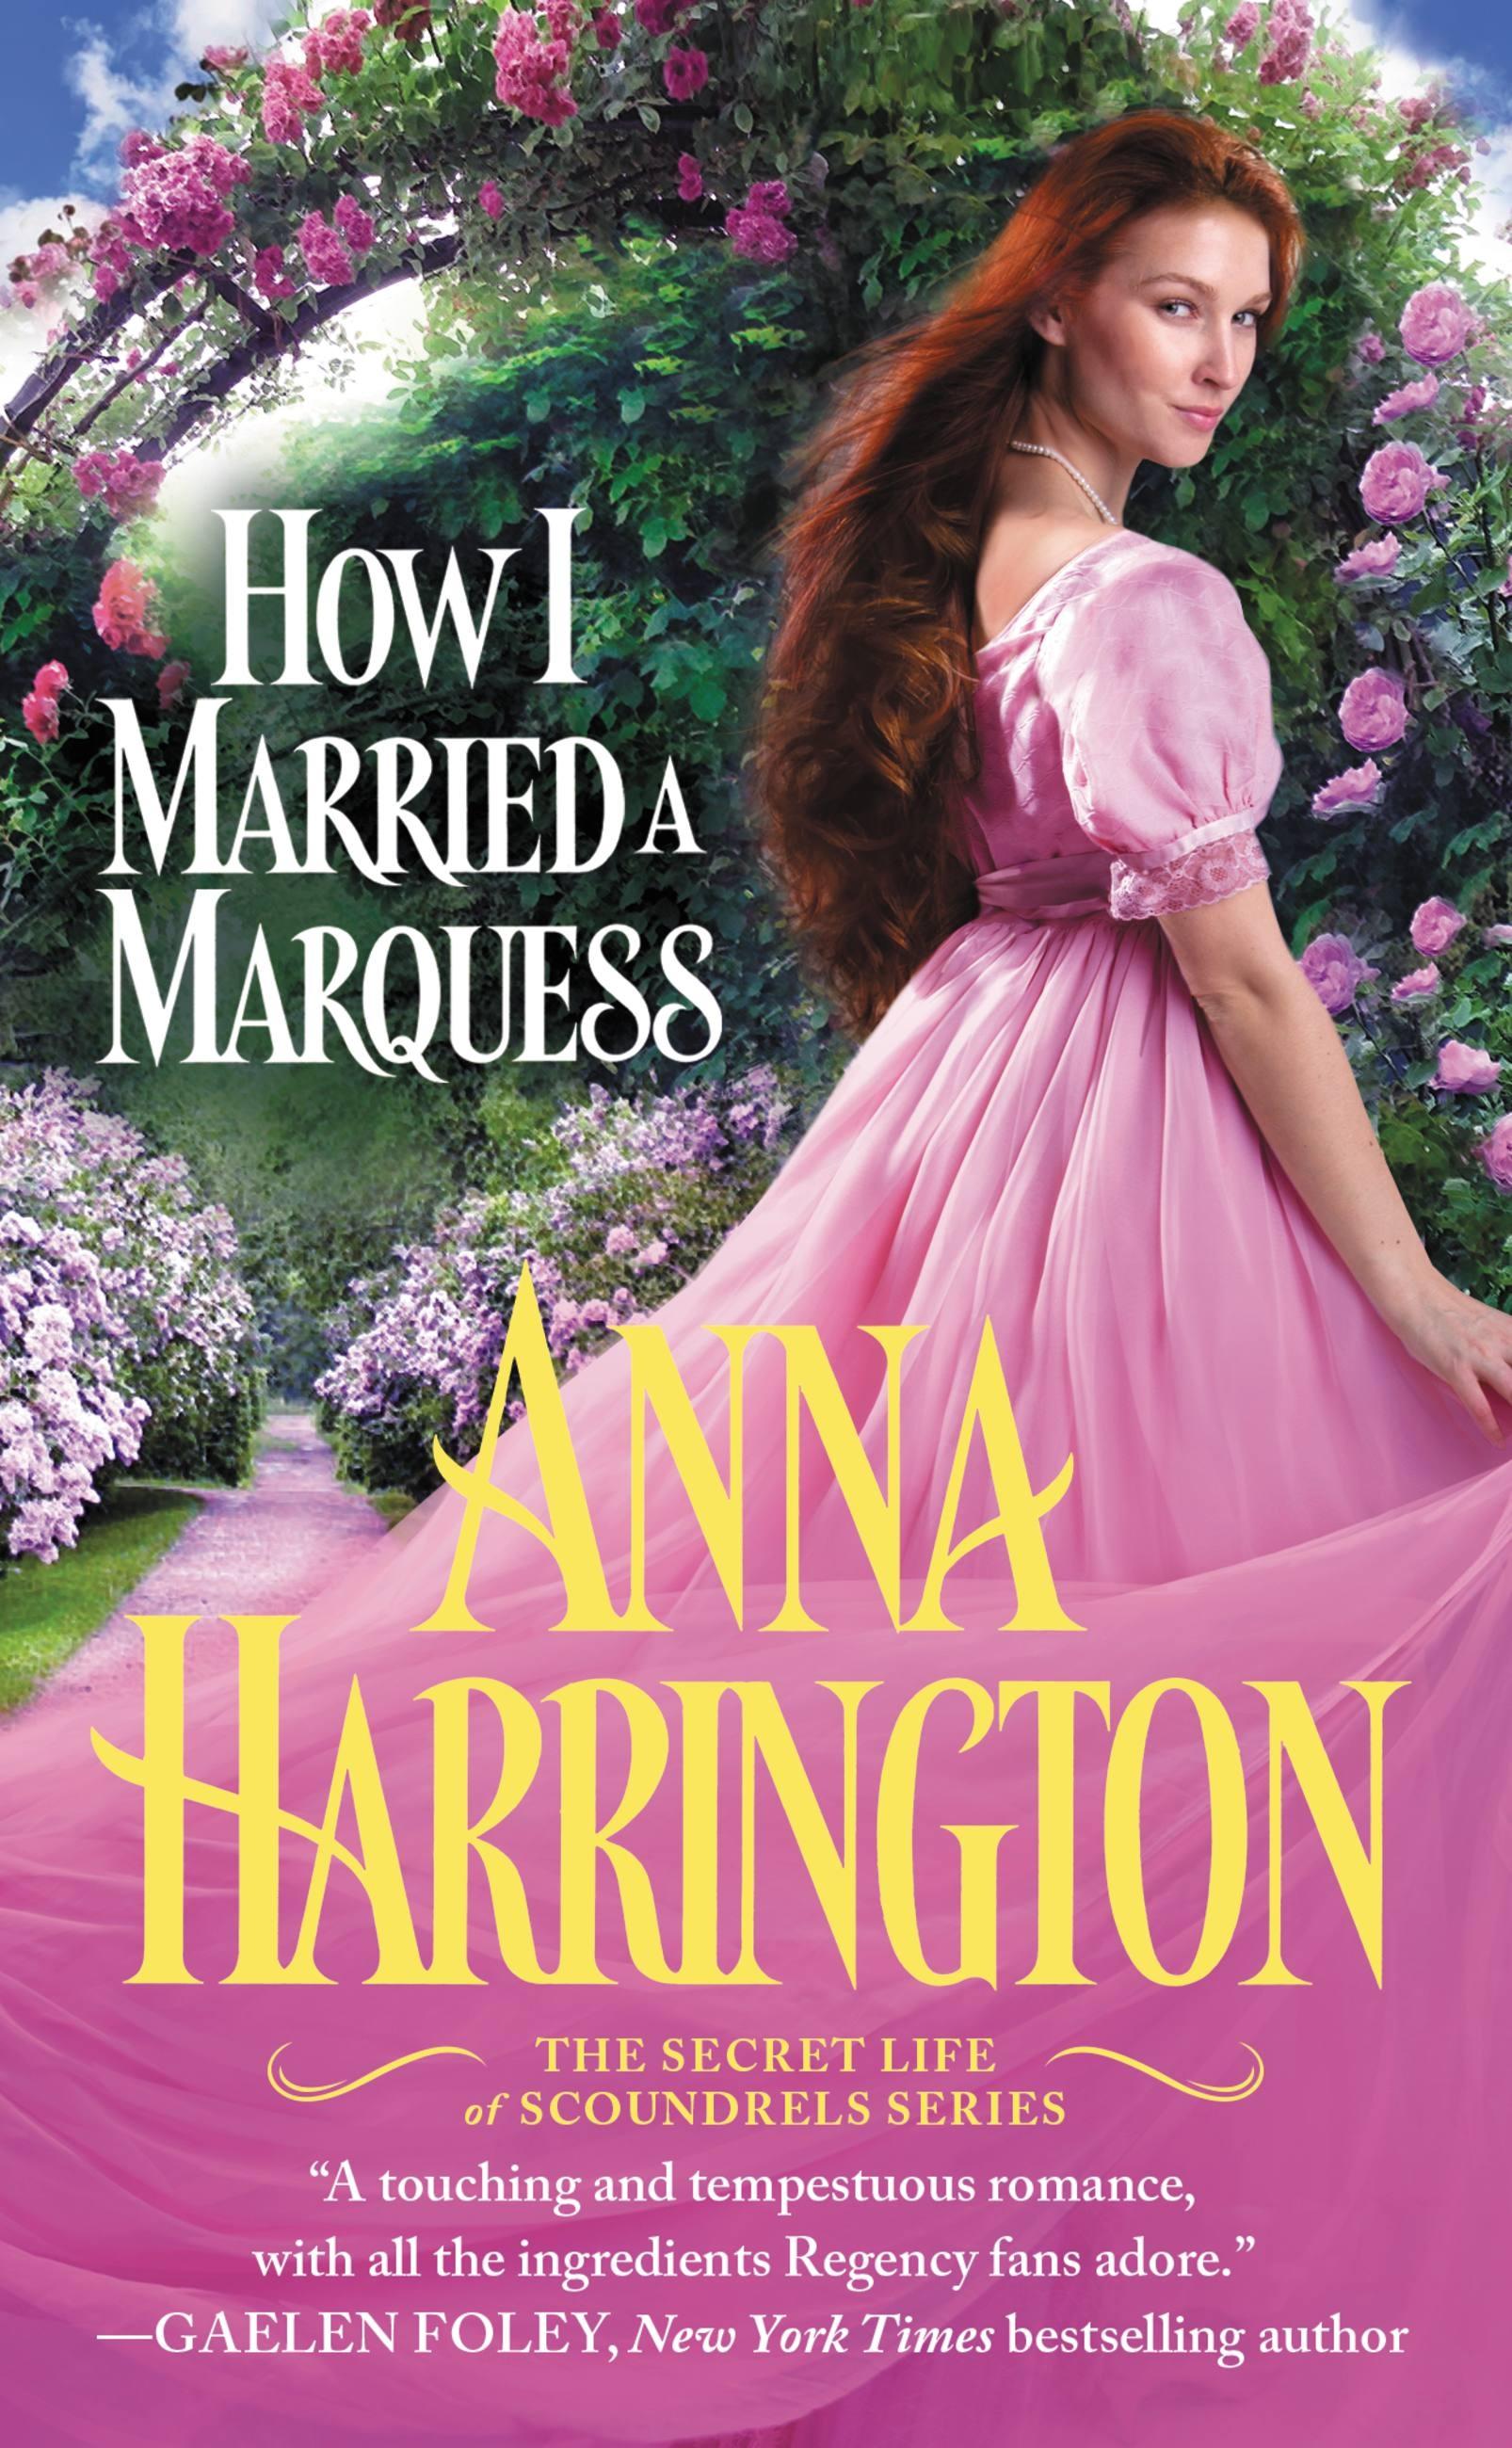 How I Married a Marquess by Anna Harrington | Hachette ...